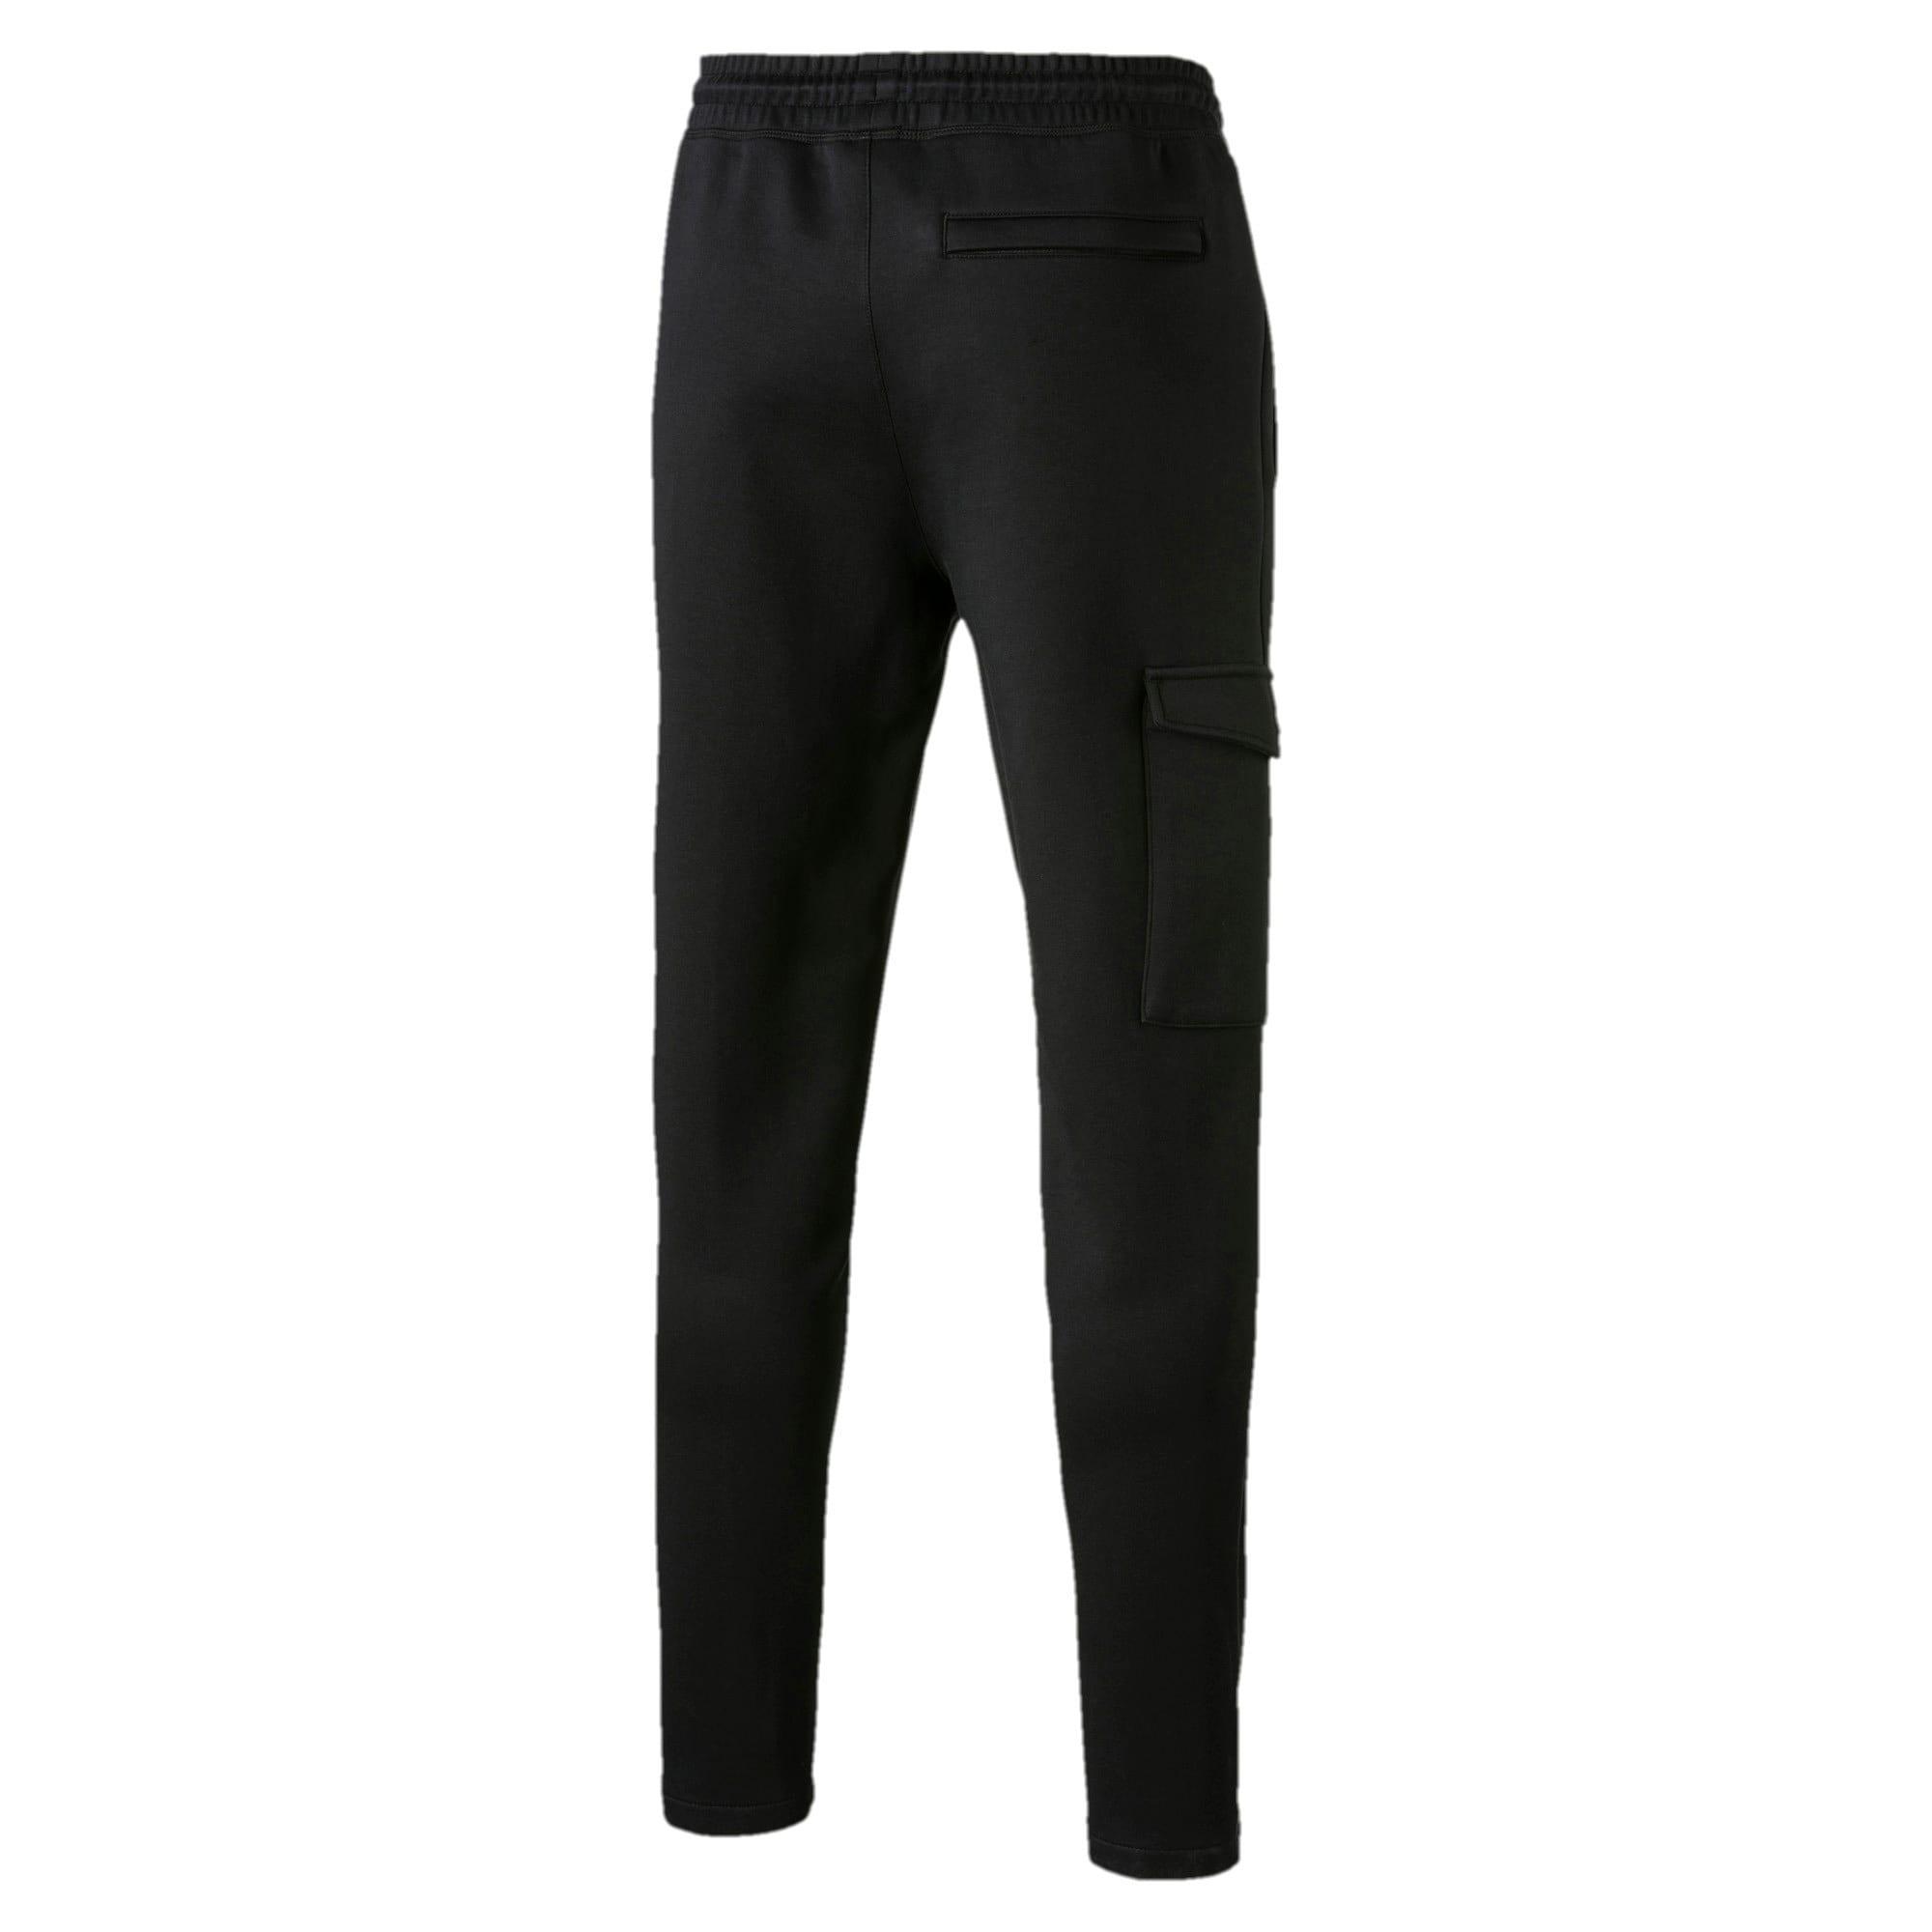 Thumbnail 3 of Classics Pocket Pants OH, Cotton Black, medium-IND